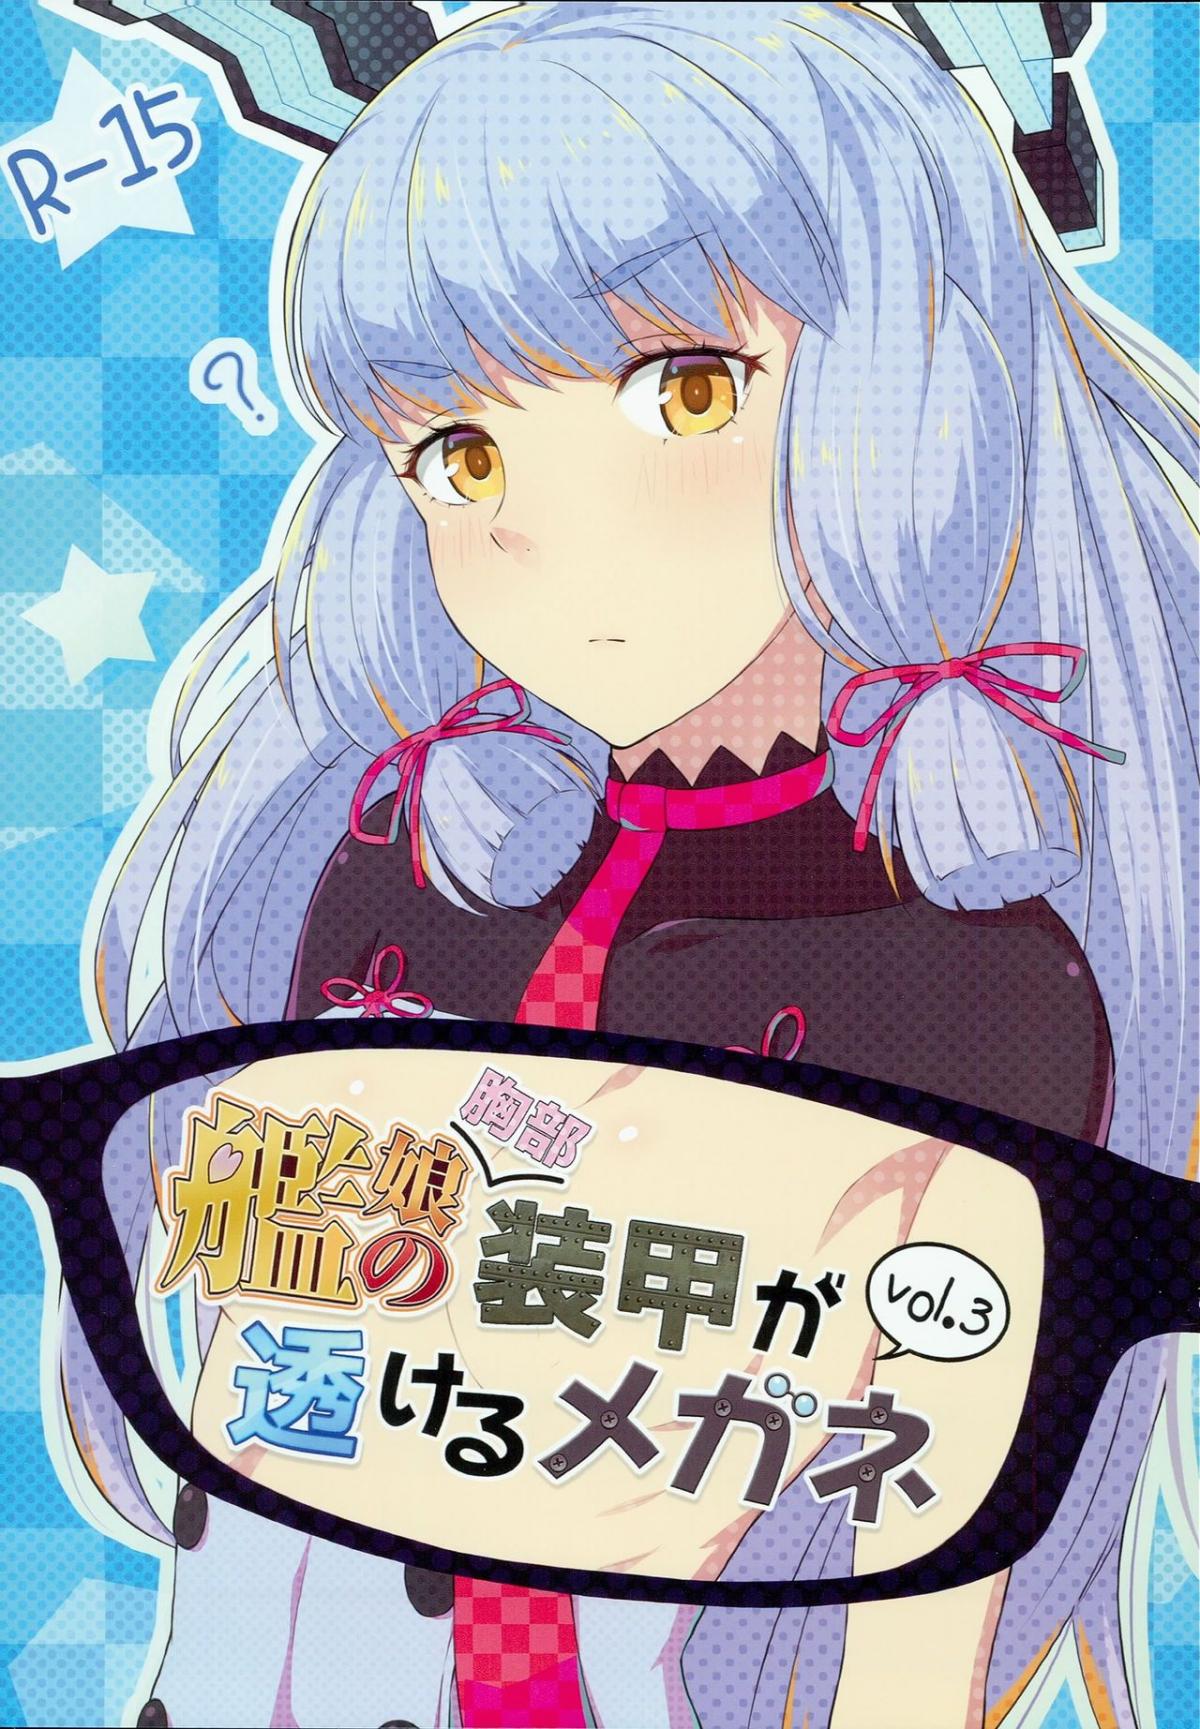 HentaiVN.net - Ảnh 2 - Kanmusu No Kyoubu Soukou Ga Sukeru Megane (Kantai Collection) - Chap 3